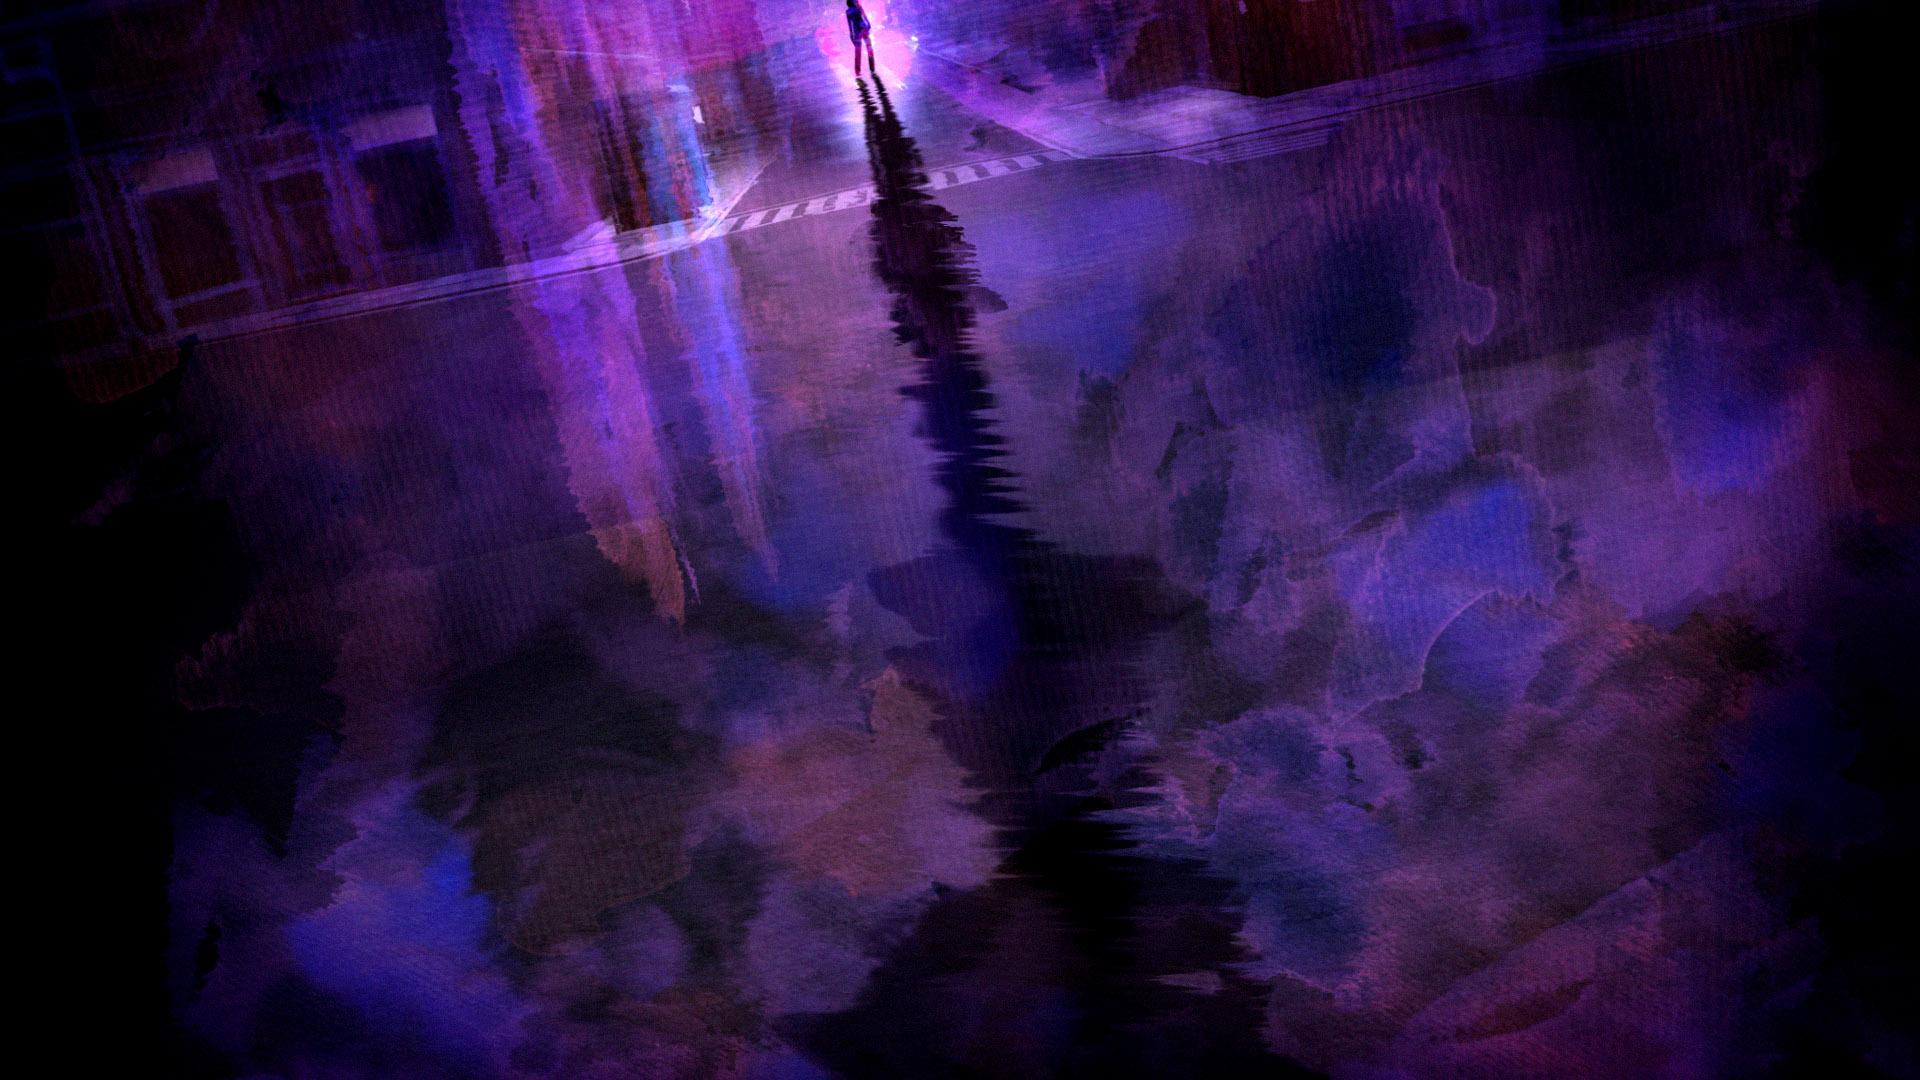 AKA_Teaser_Dreams_Texted_PreLaunch_Stereo_ProResHQ (00851)_web.jpg